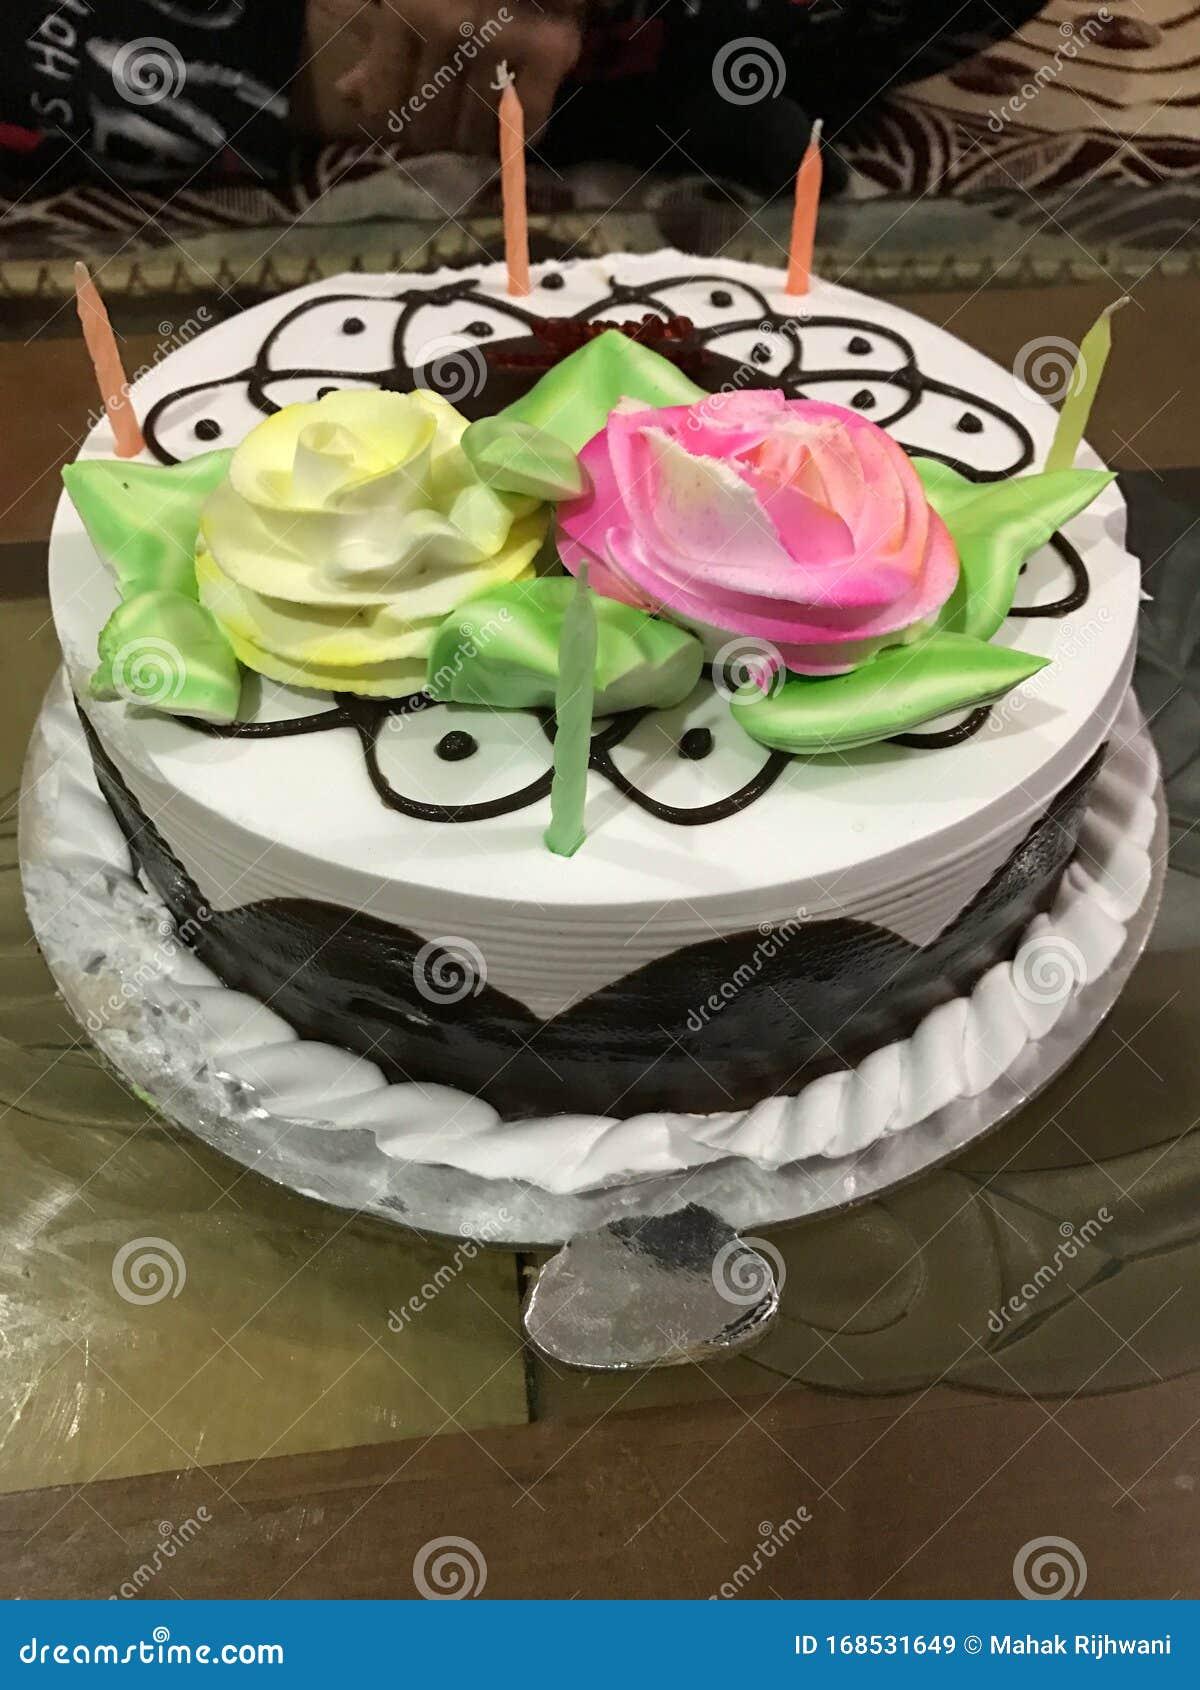 Incredible Yummy Birthday Cake Stock Image Image Of Yummy Lovery 168531649 Funny Birthday Cards Online Necthendildamsfinfo